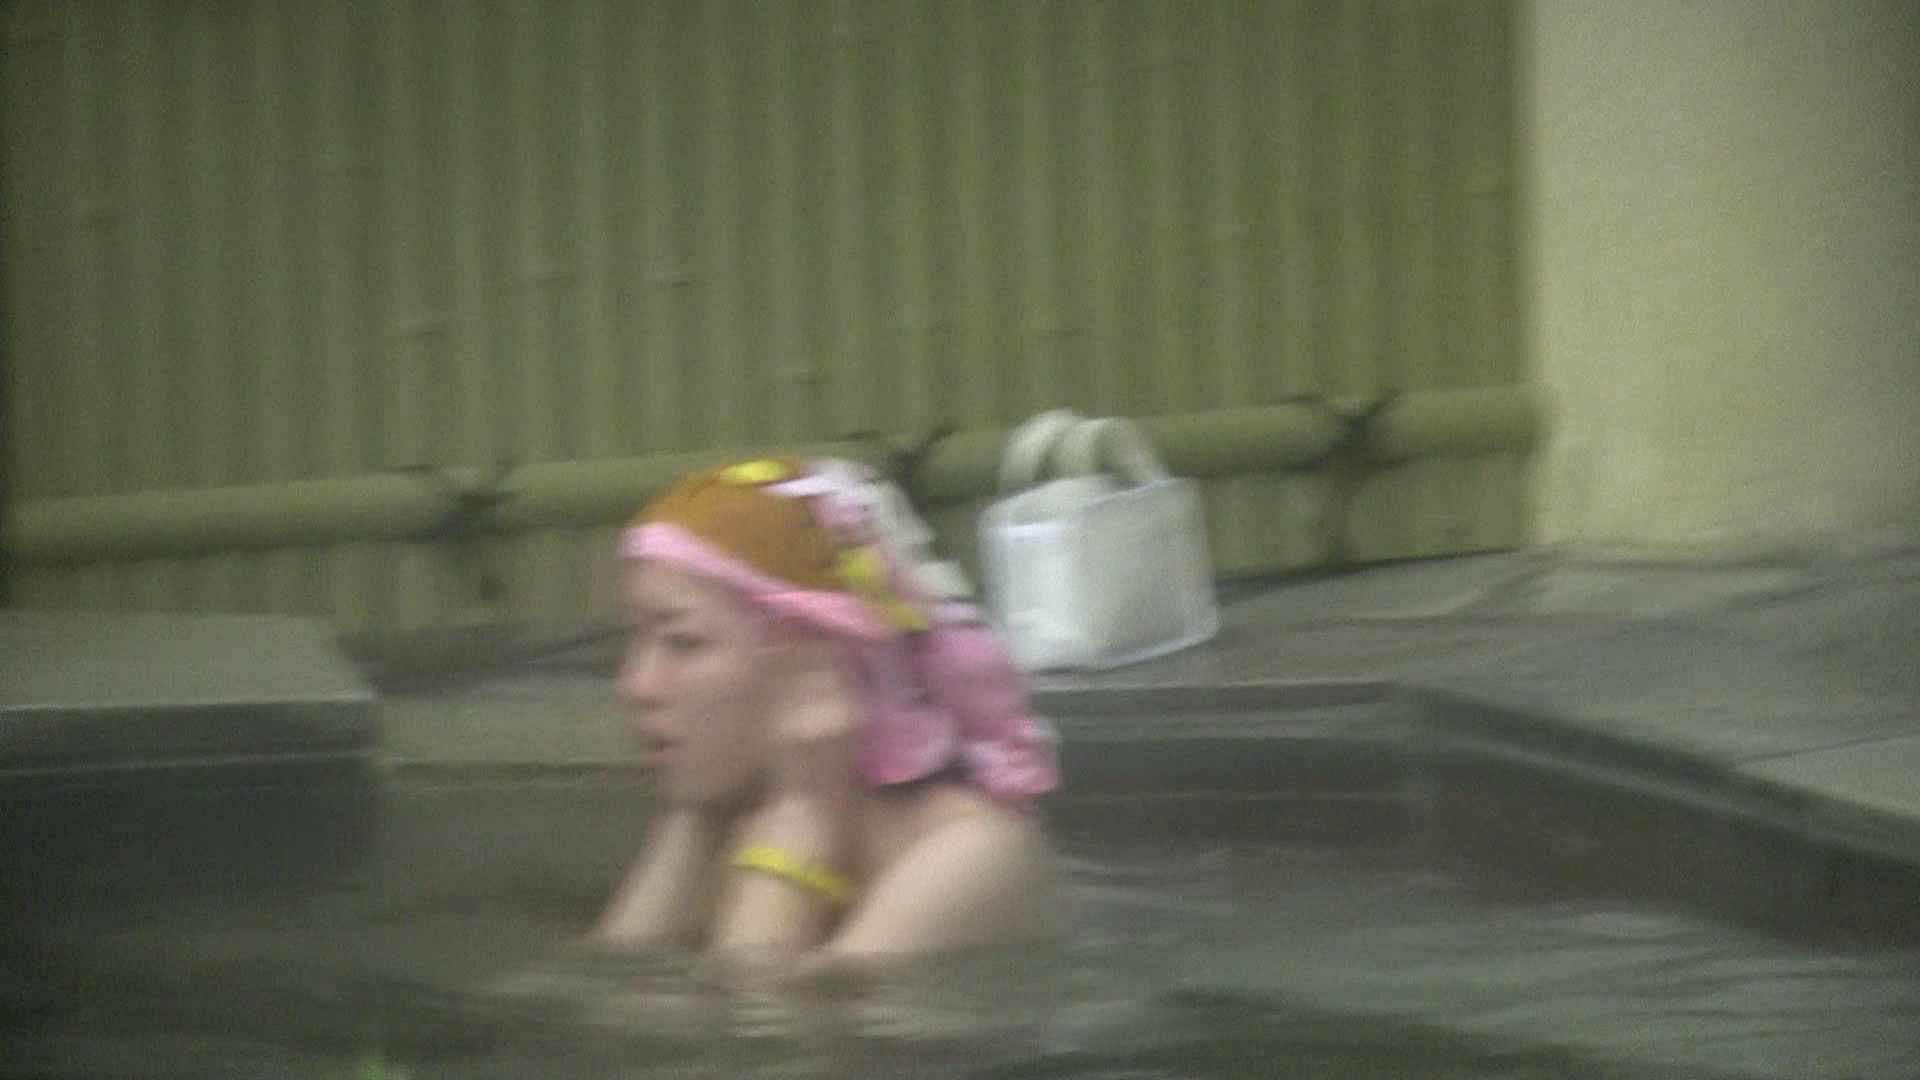 Aquaな露天風呂Vol.171 0 | 0  19連発 13